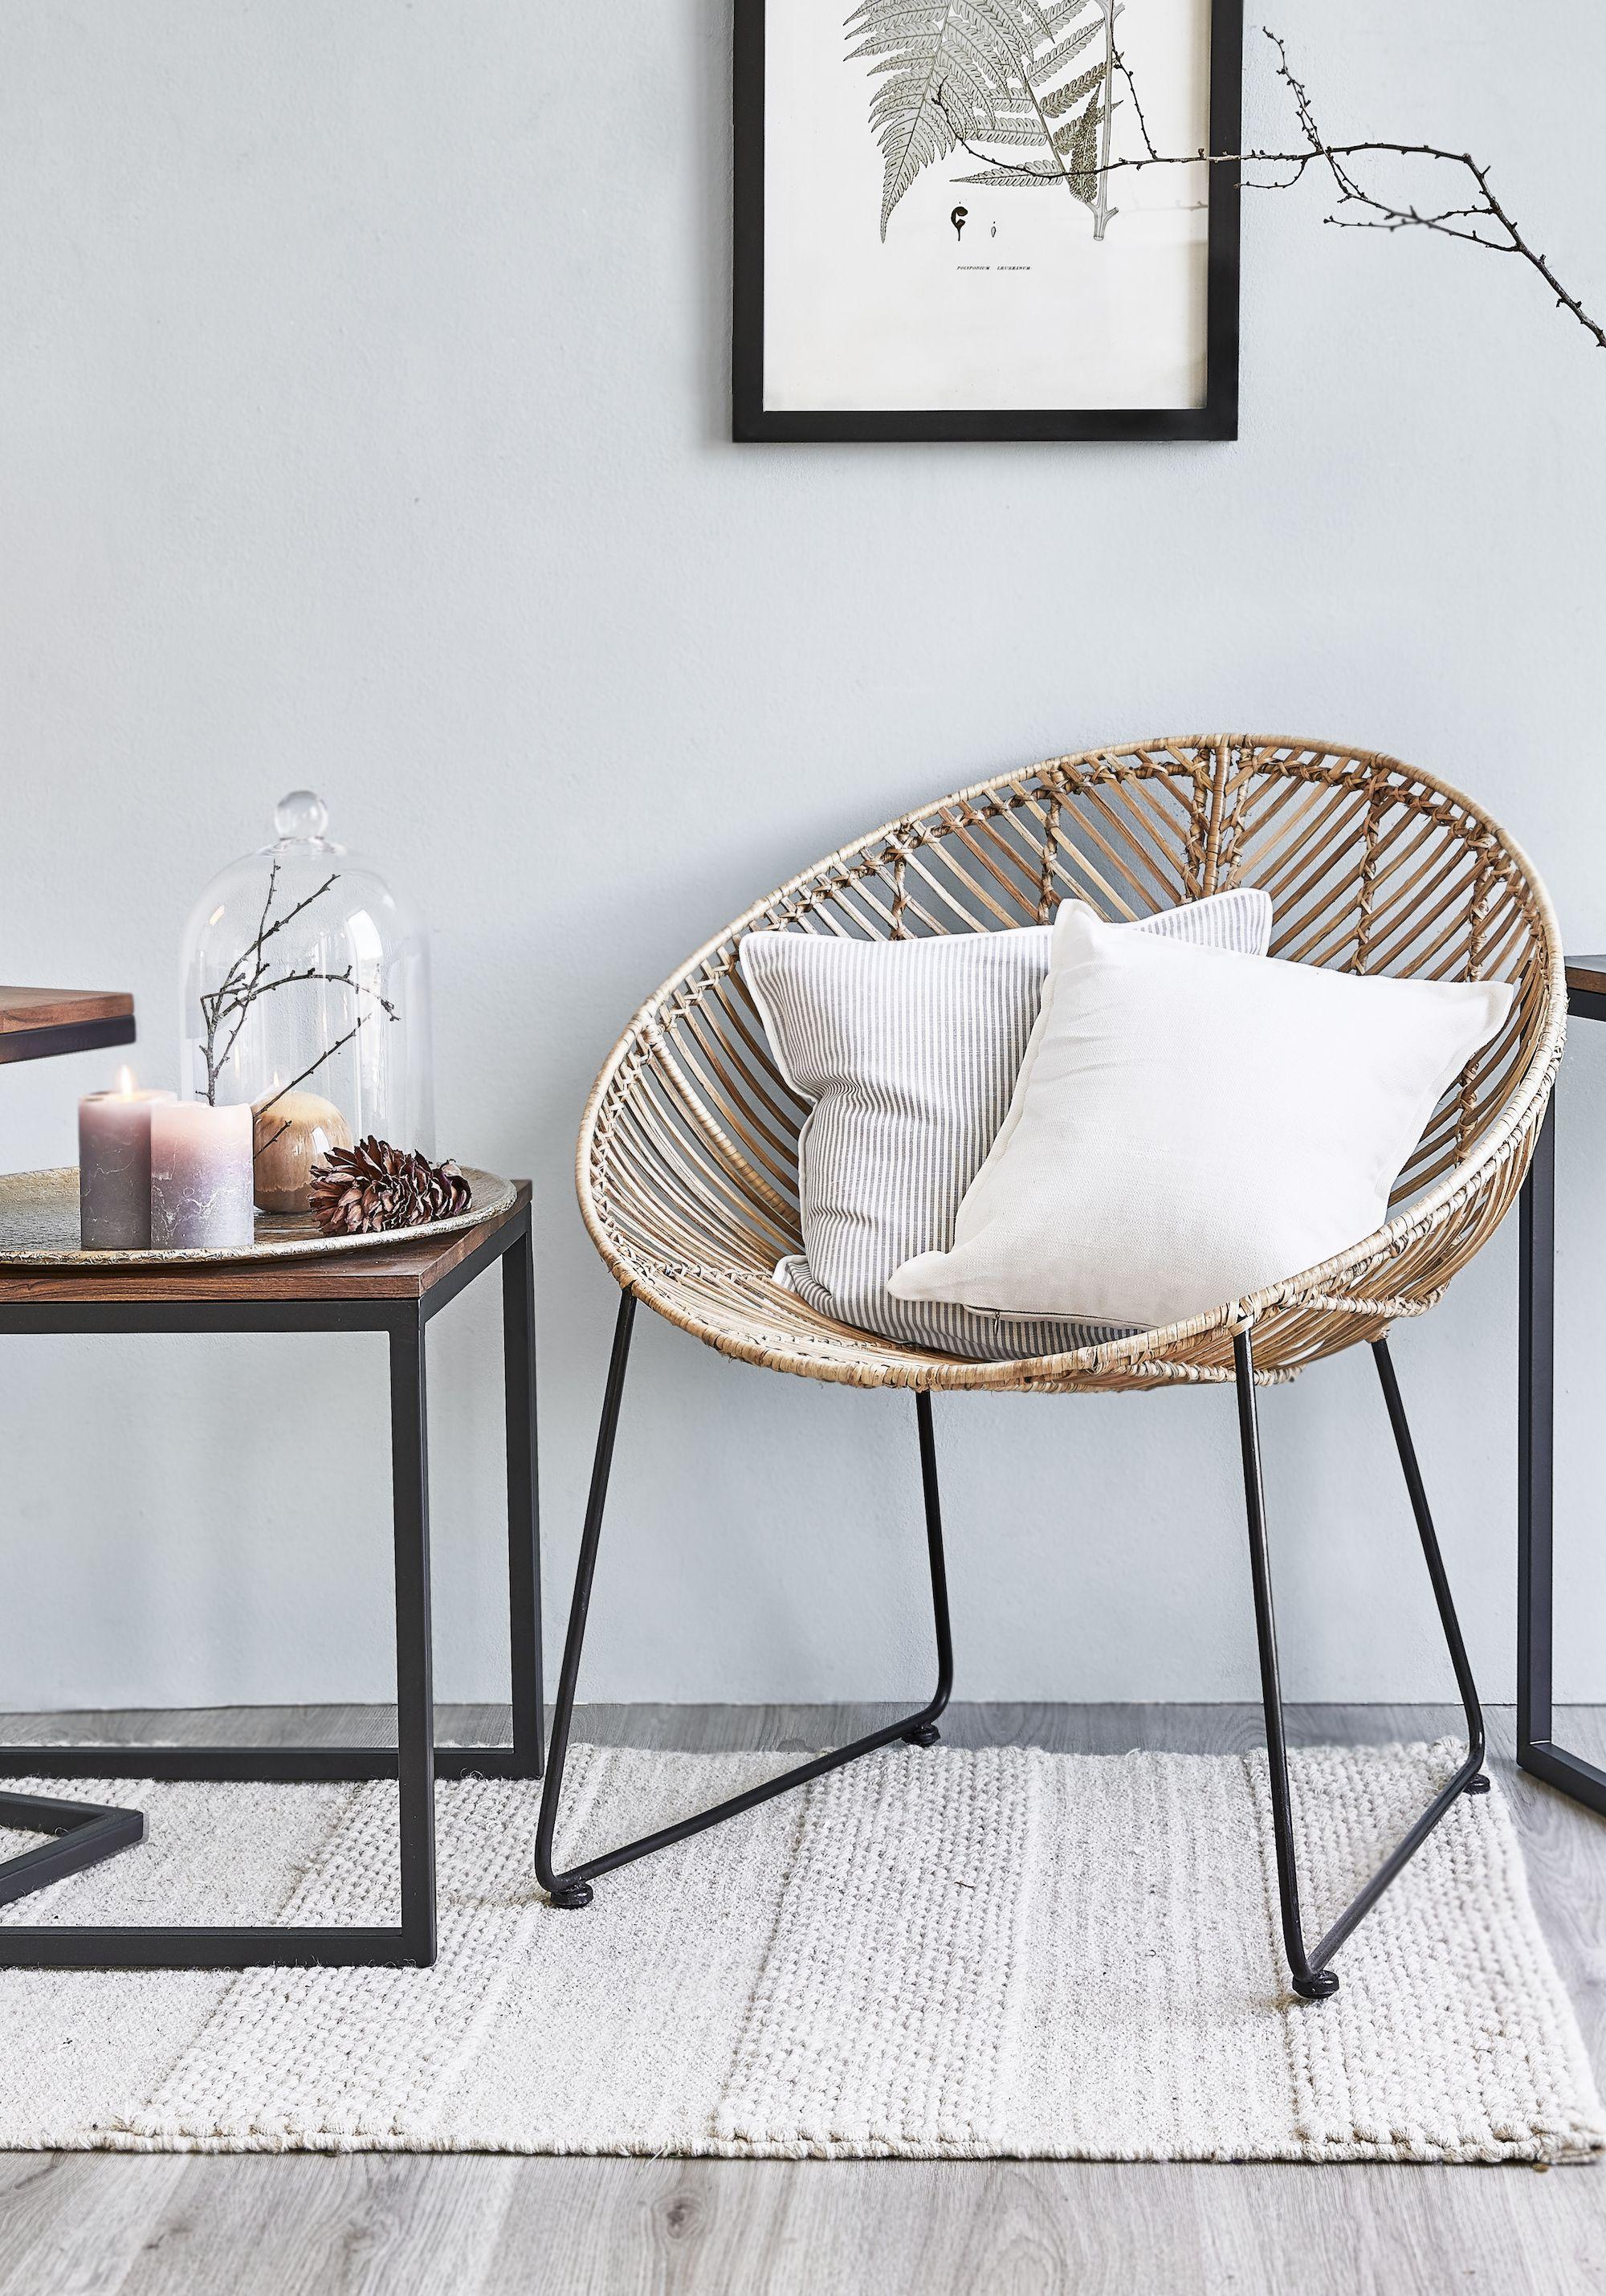 Rattan-Sessel Cocon | Pinterest | Korbsessel, Korbstühle und Rattan